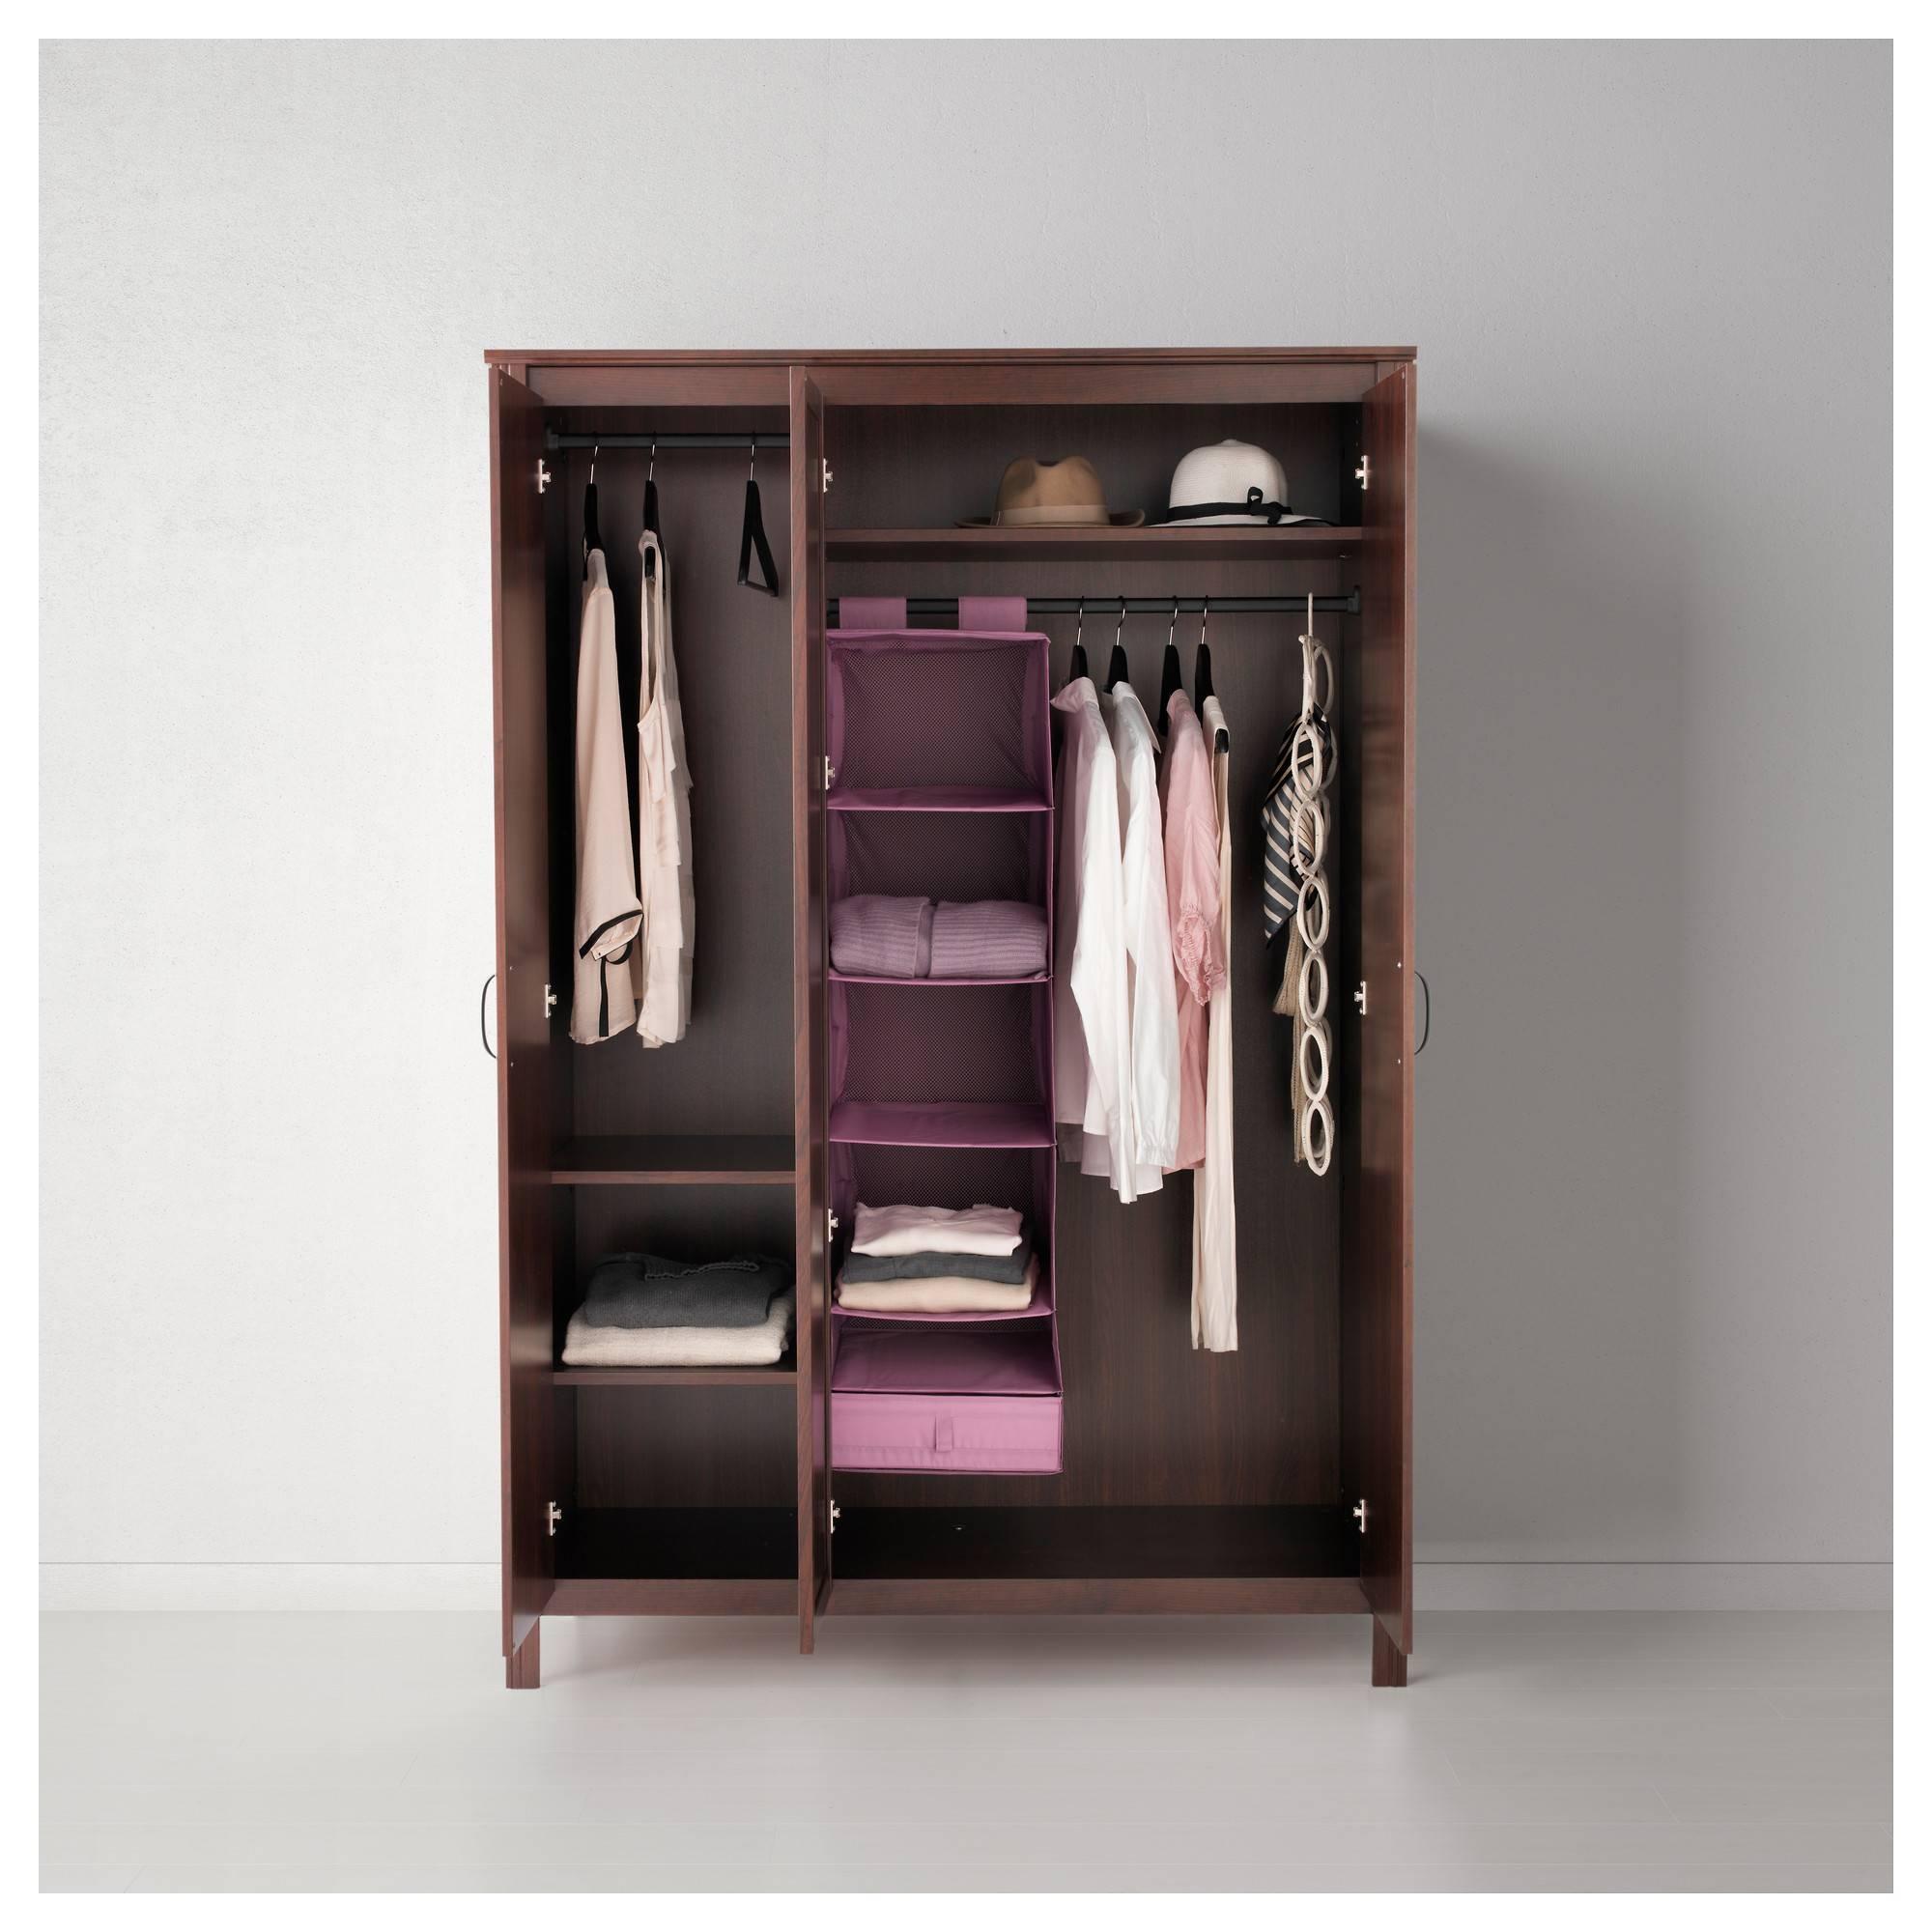 Brusali Wardrobe With 3 Doors - Ikea regarding Dark Wood Wardrobes Ikea (Image 6 of 30)